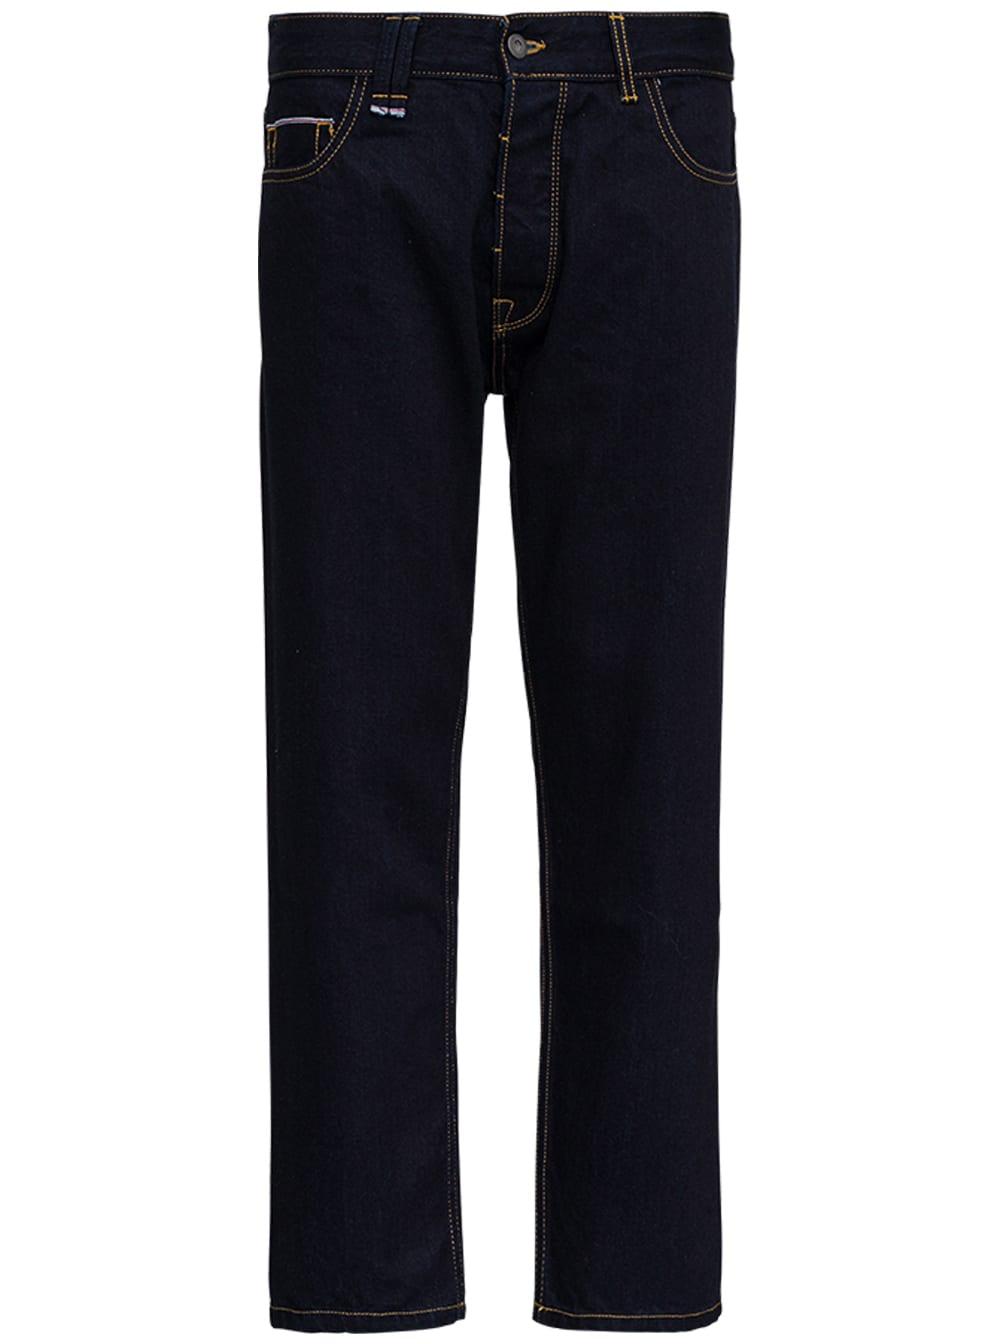 Rowcut Five Pockets Denim Jeans